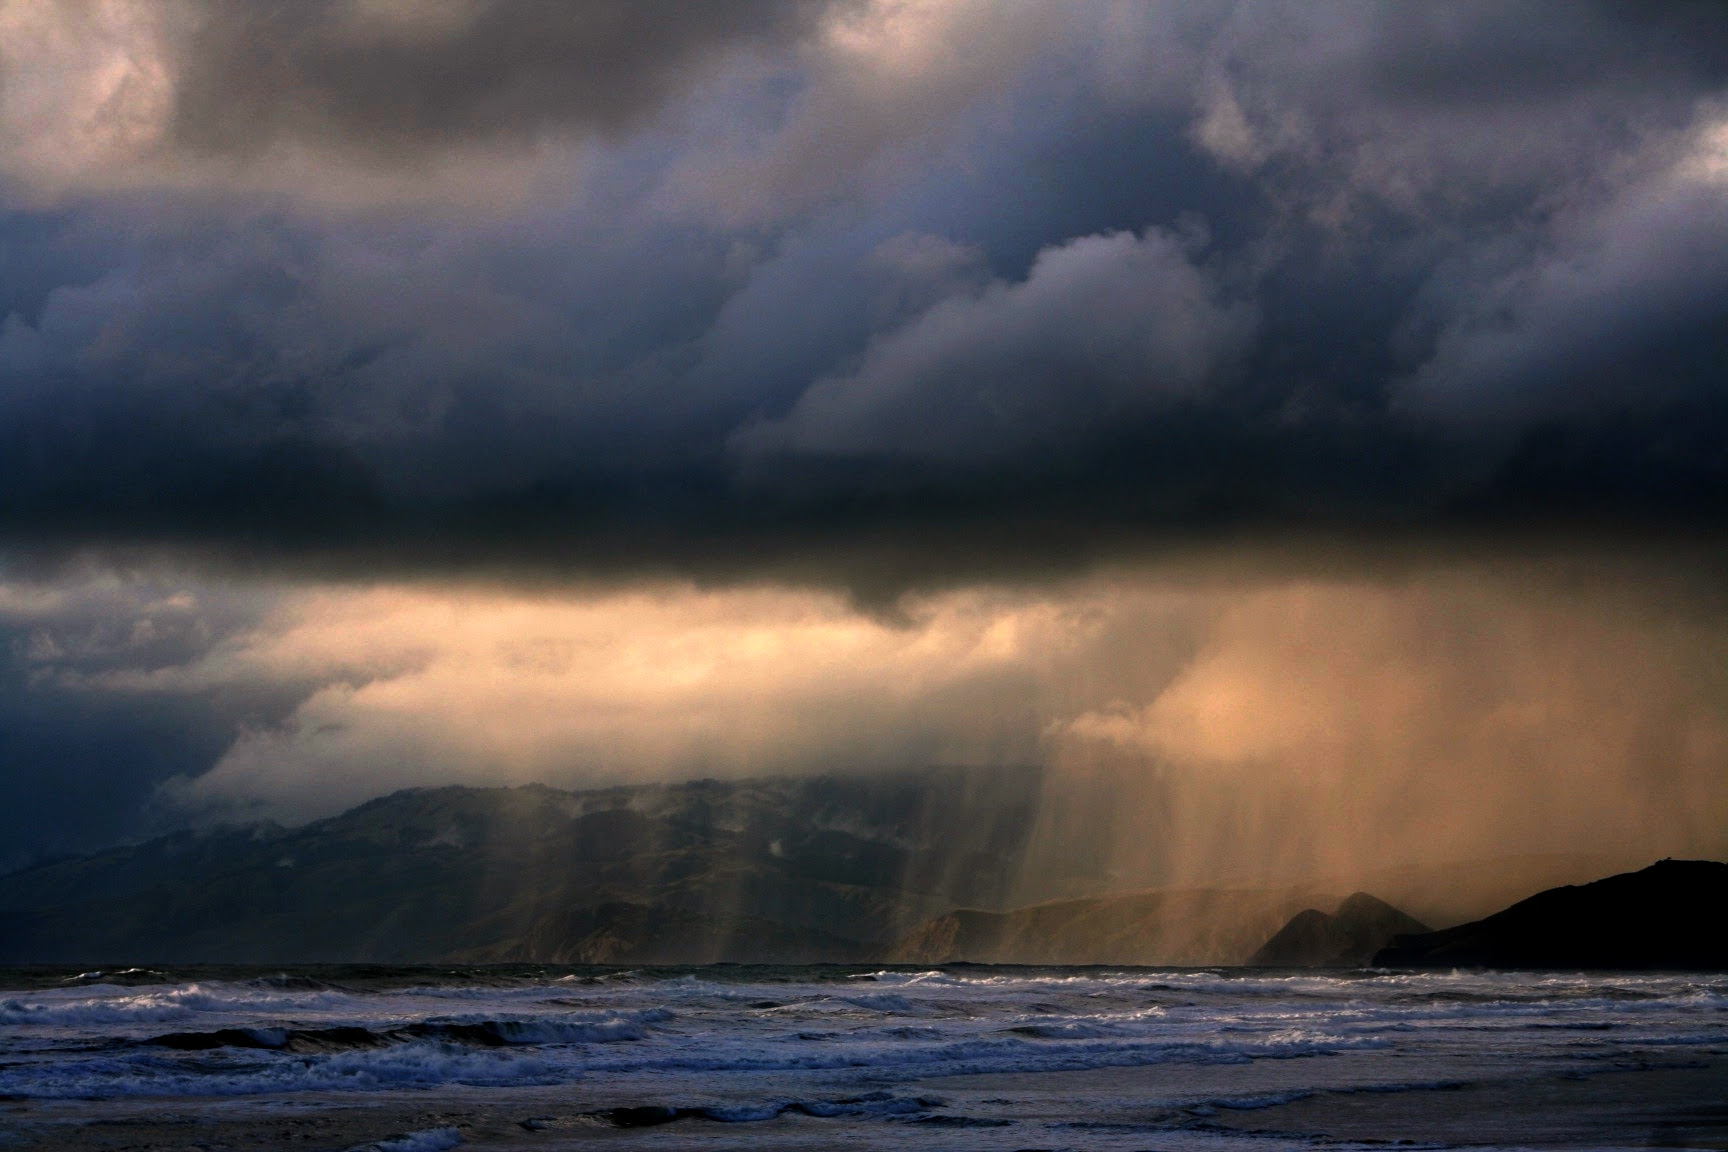 http://upload.wikimedia.org/wikipedia/commons/e/e2/Rain_ot_ocean_beach.jpg